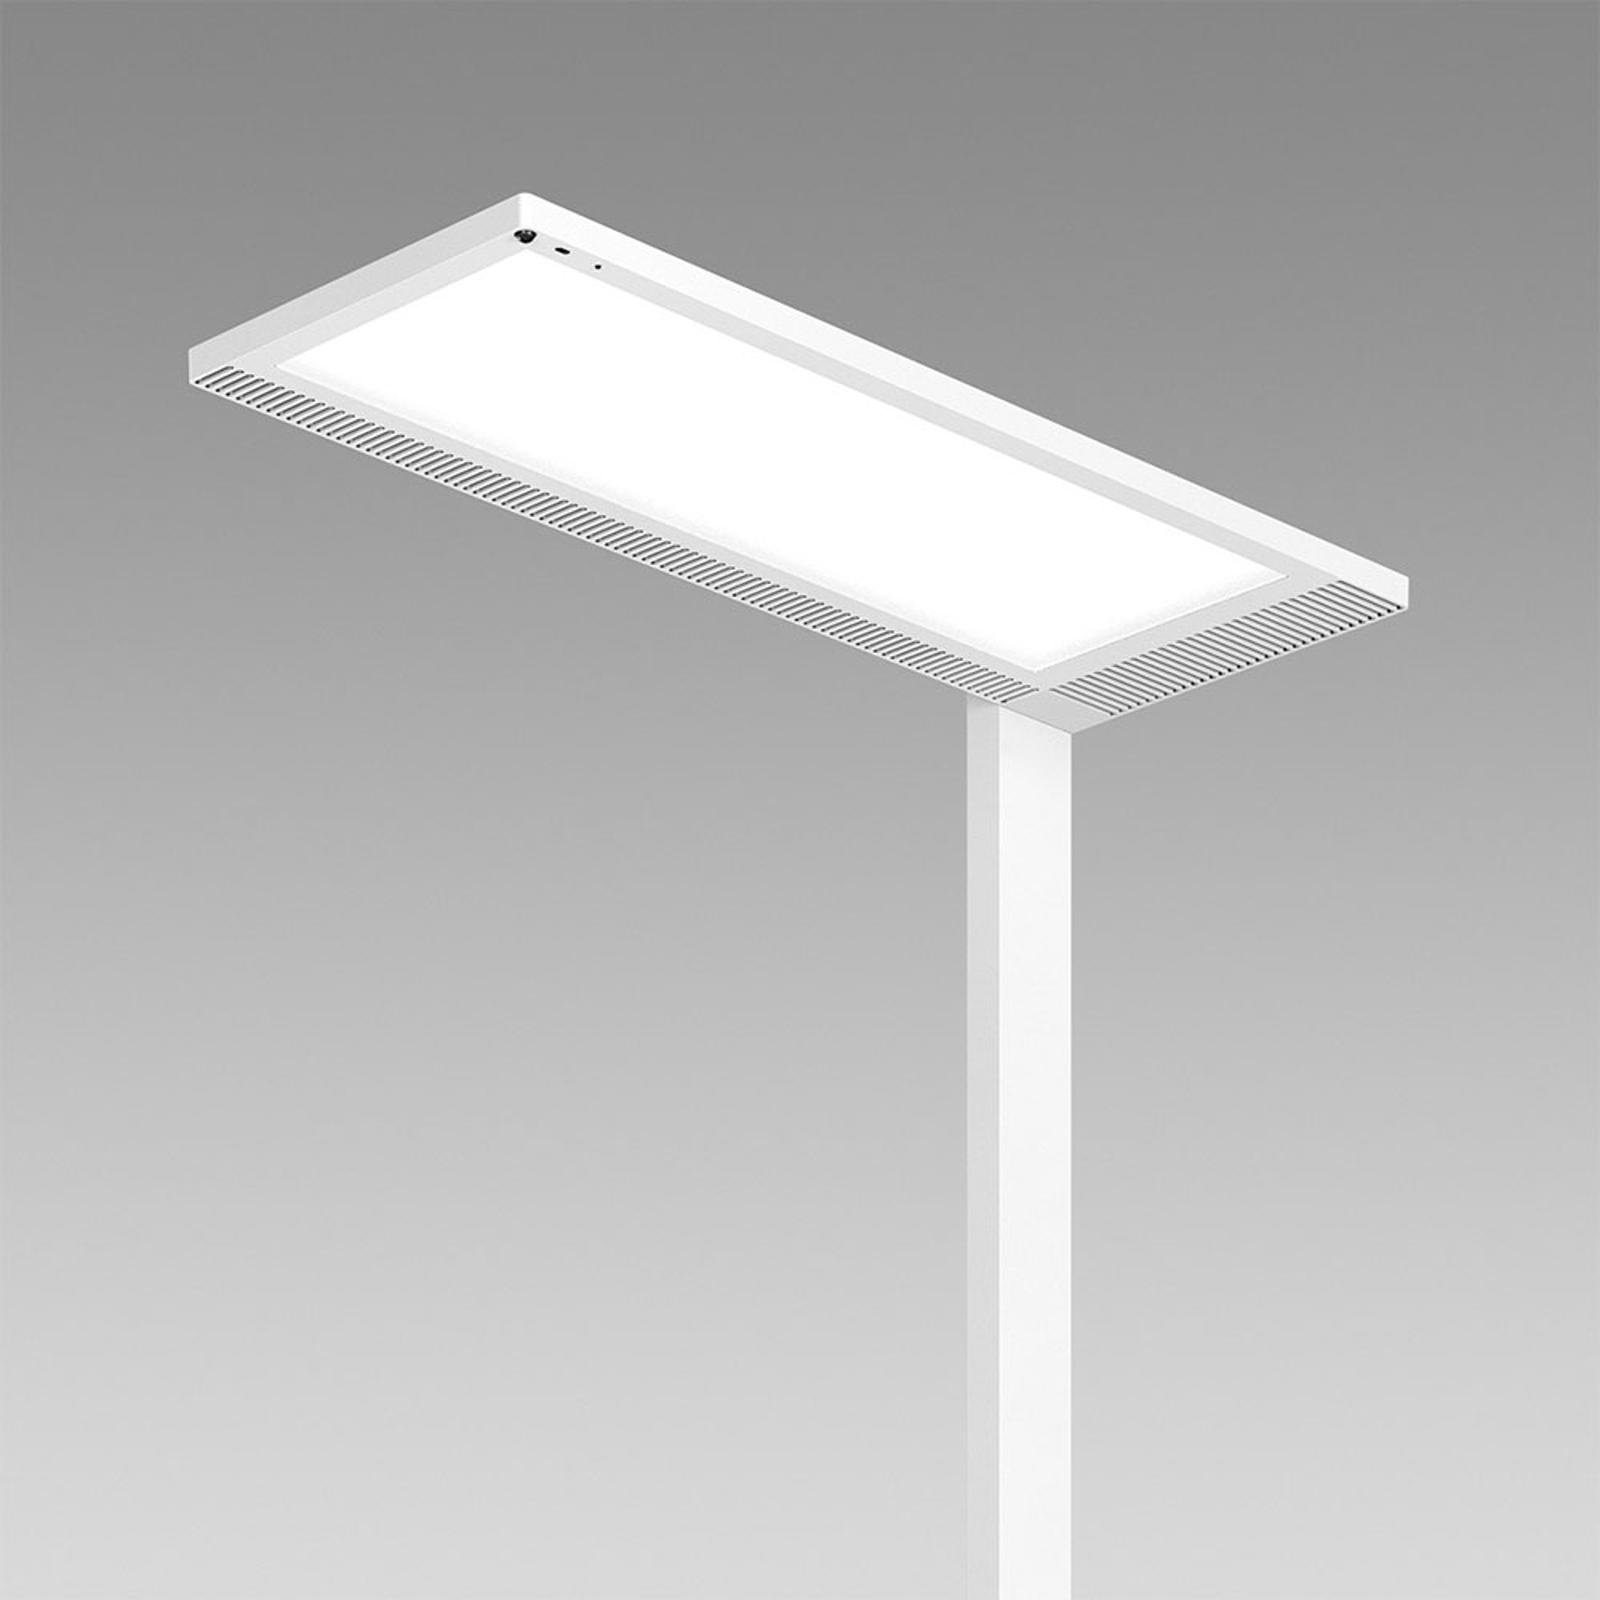 Regent Lighting Lightpad LED 1 tunable vitt höger